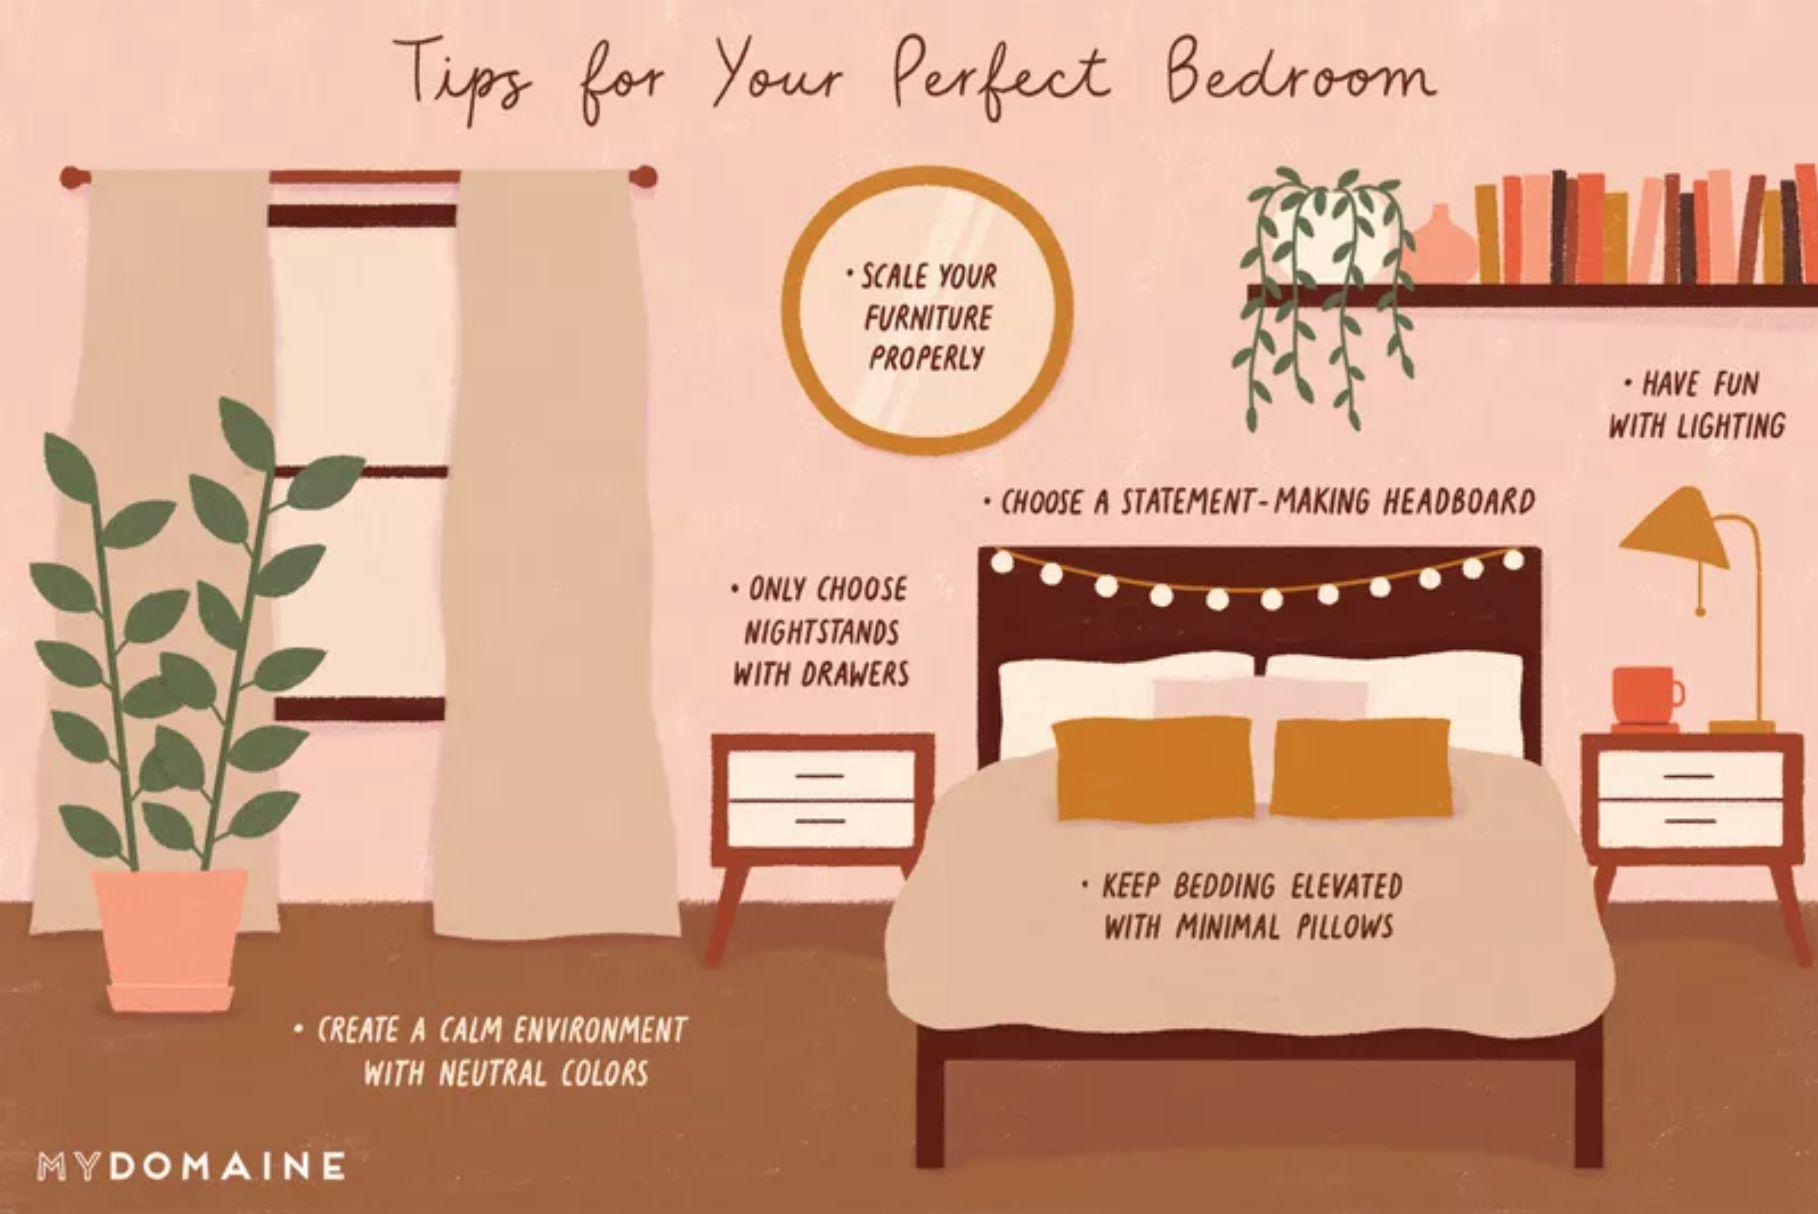 12 Bedroom Decorating Mistakes Interior Designers Notice